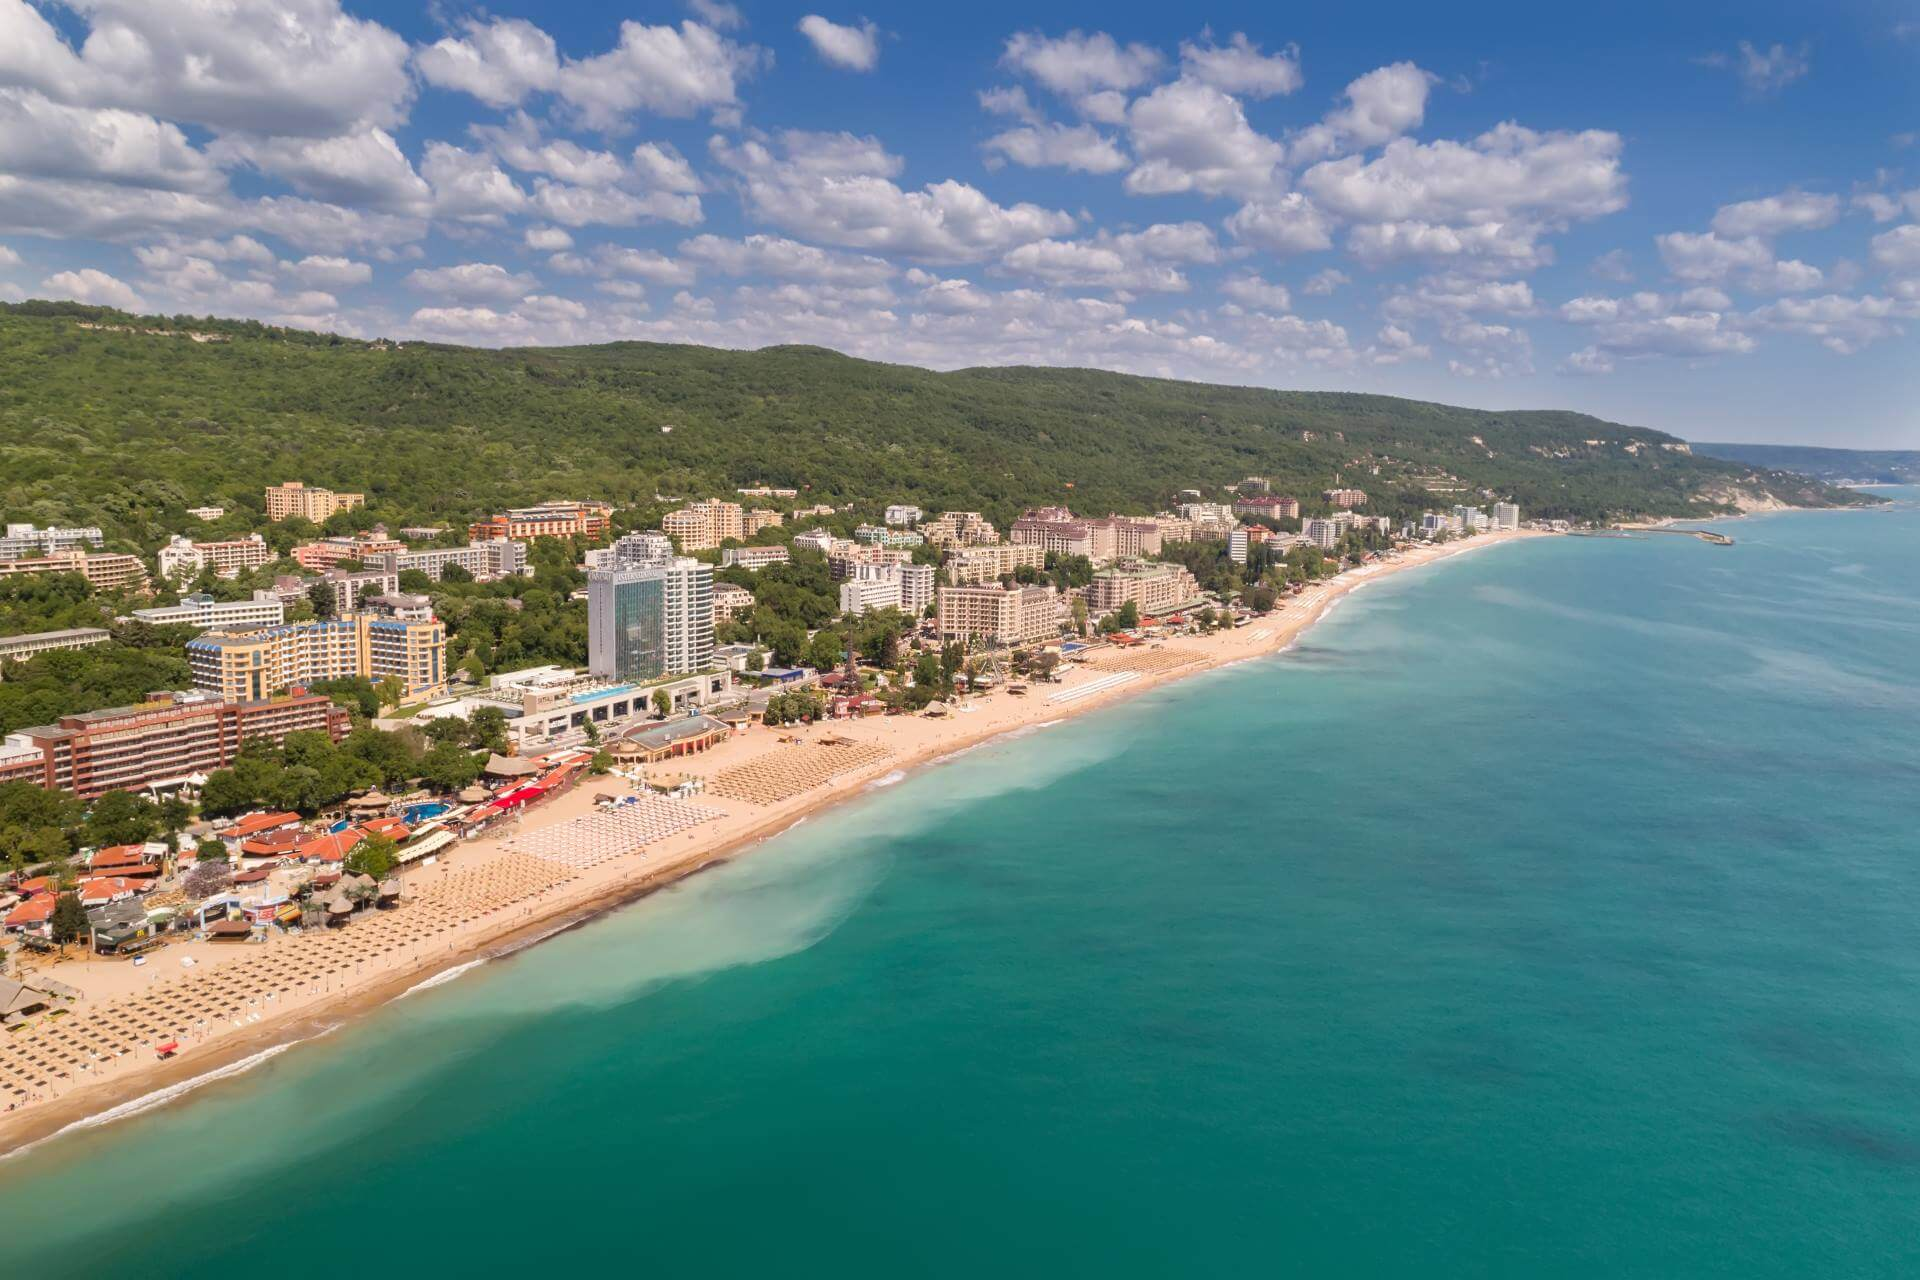 Hotels und Strand am Goldstrand in Bulgarien